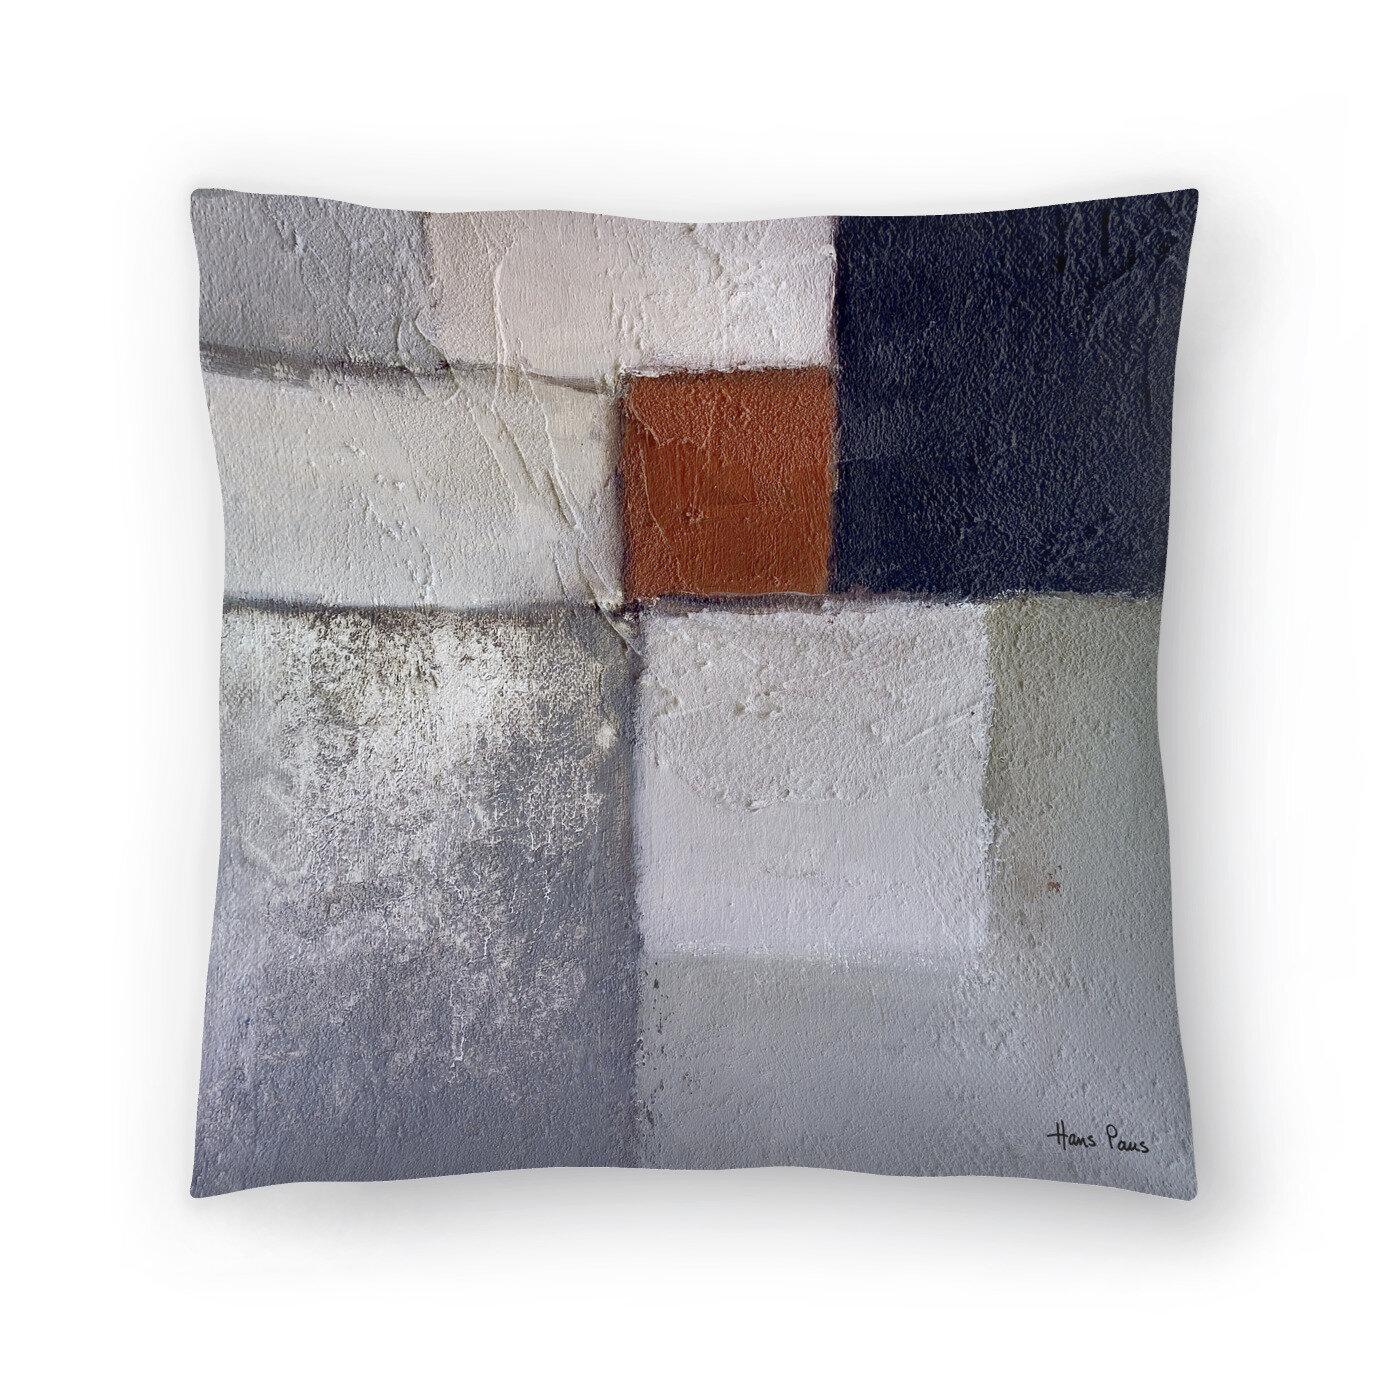 East Urban Home Hans Paus Concrescence 5 Throw Pillow Wayfair